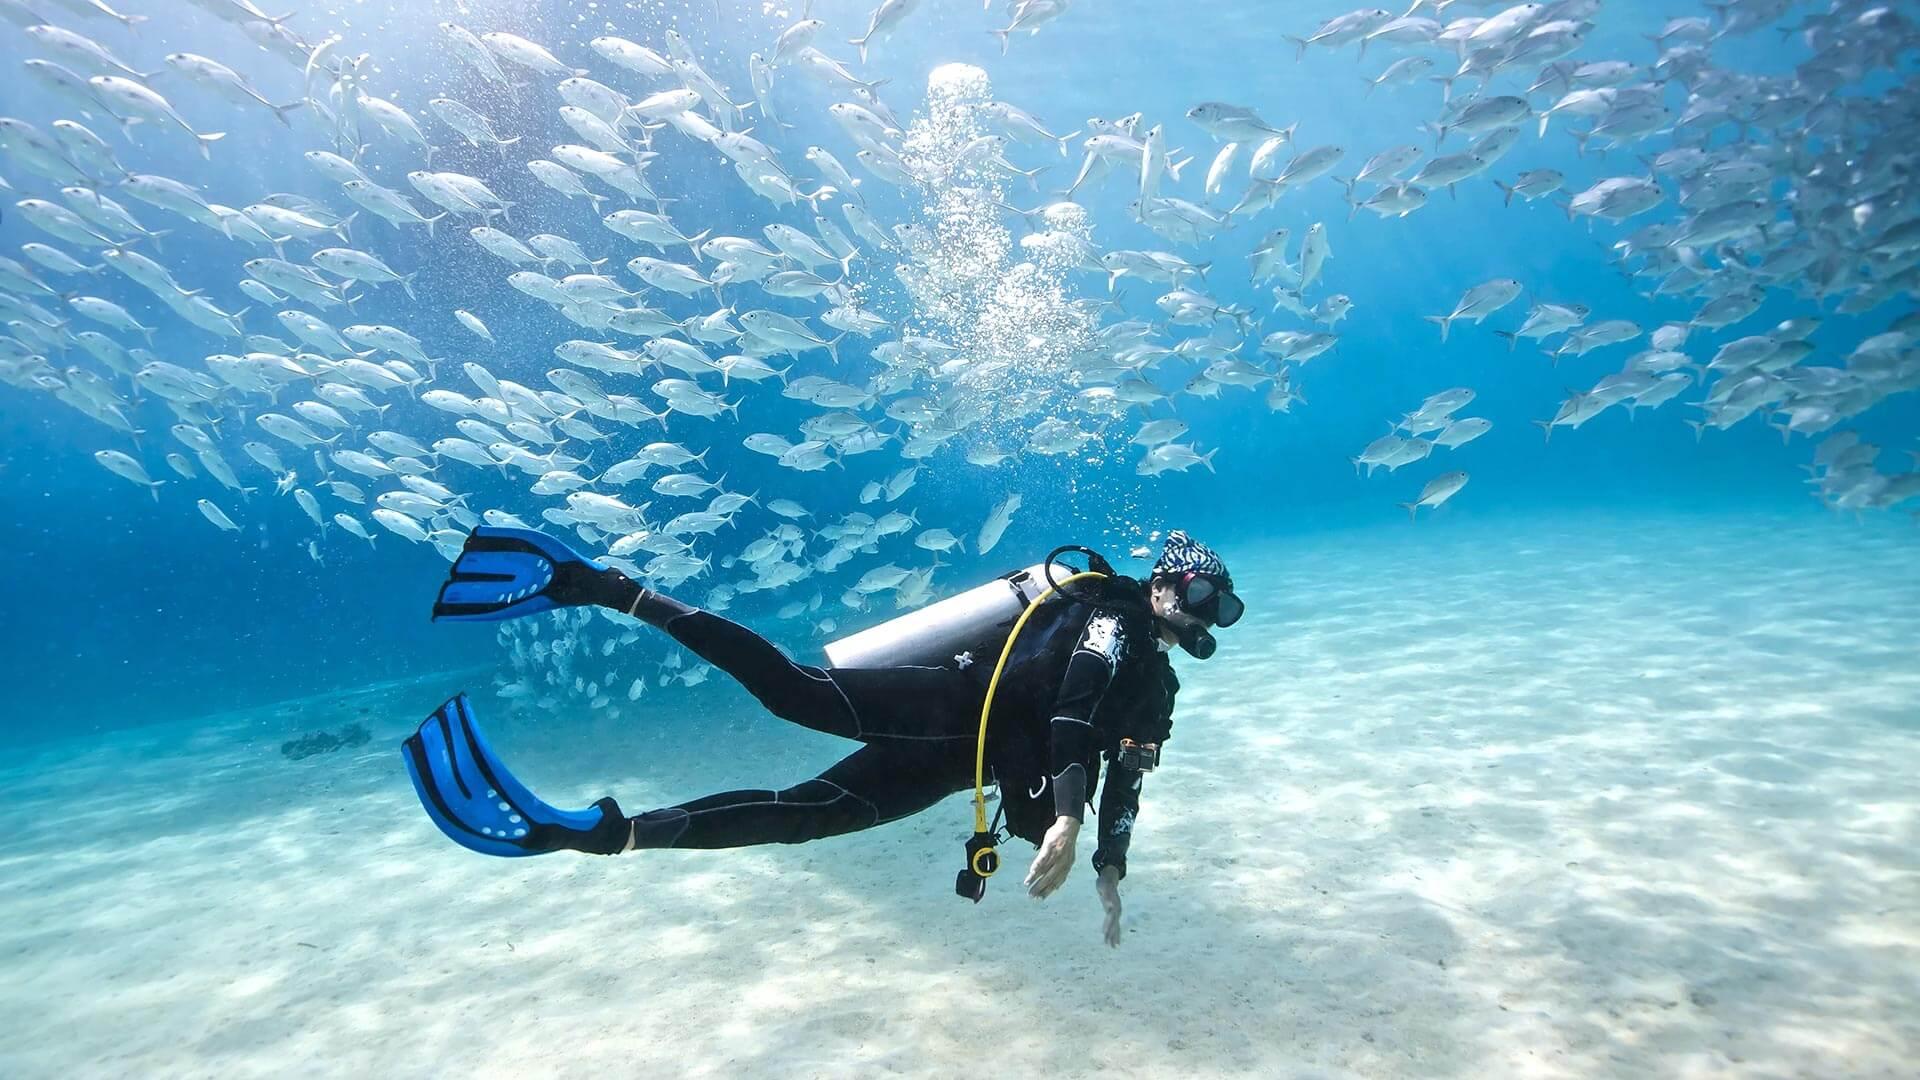 Adenture sports - Snorkeling